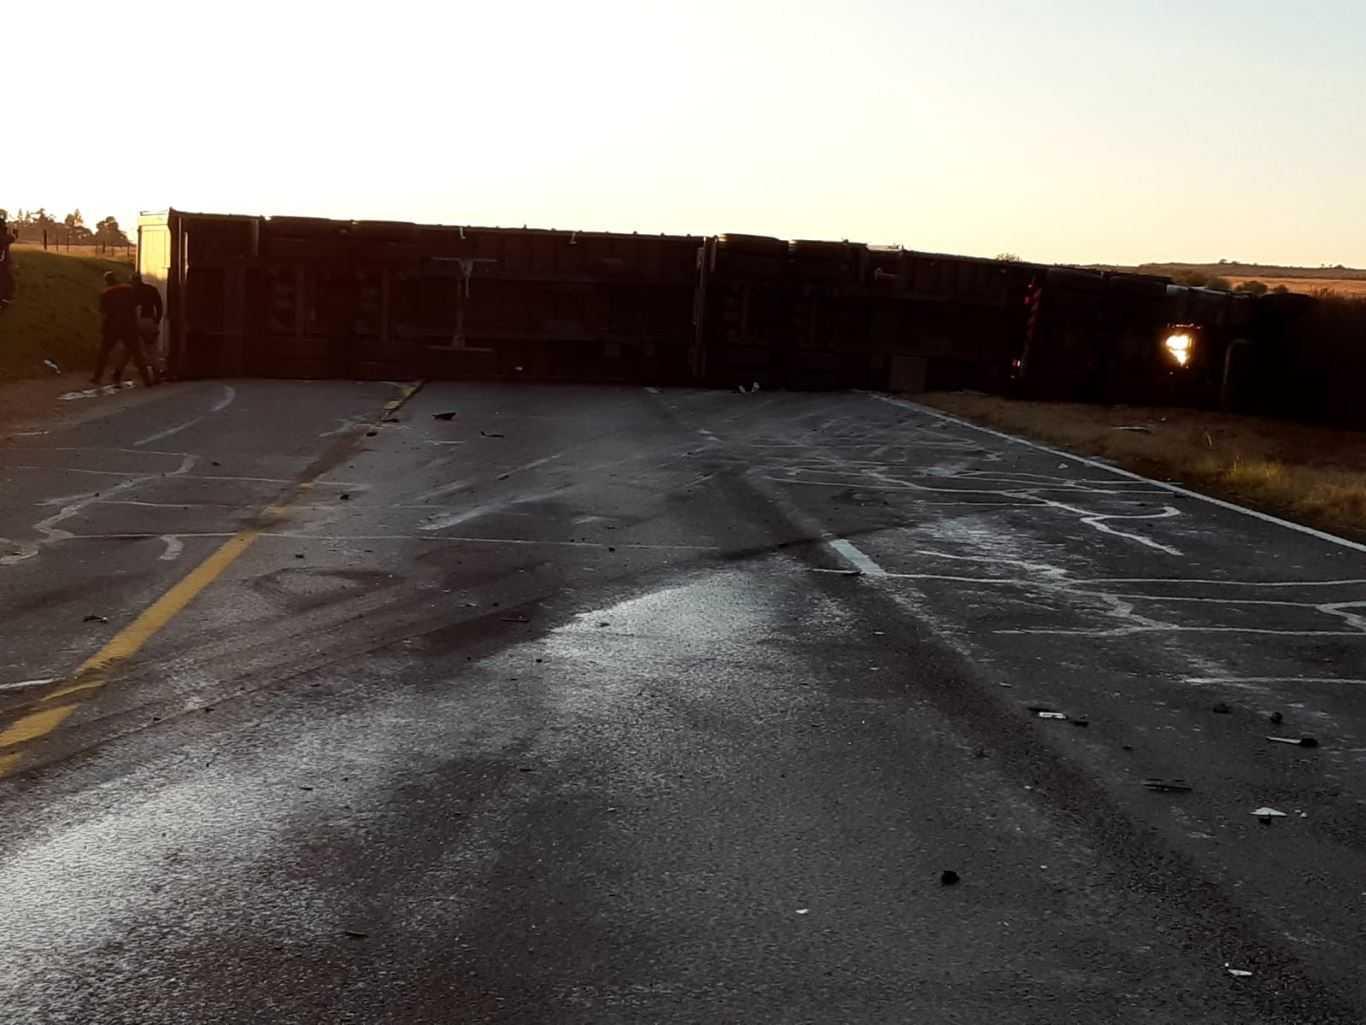 N3 Heidelberg truck and car crash leaves both drivers critically injured